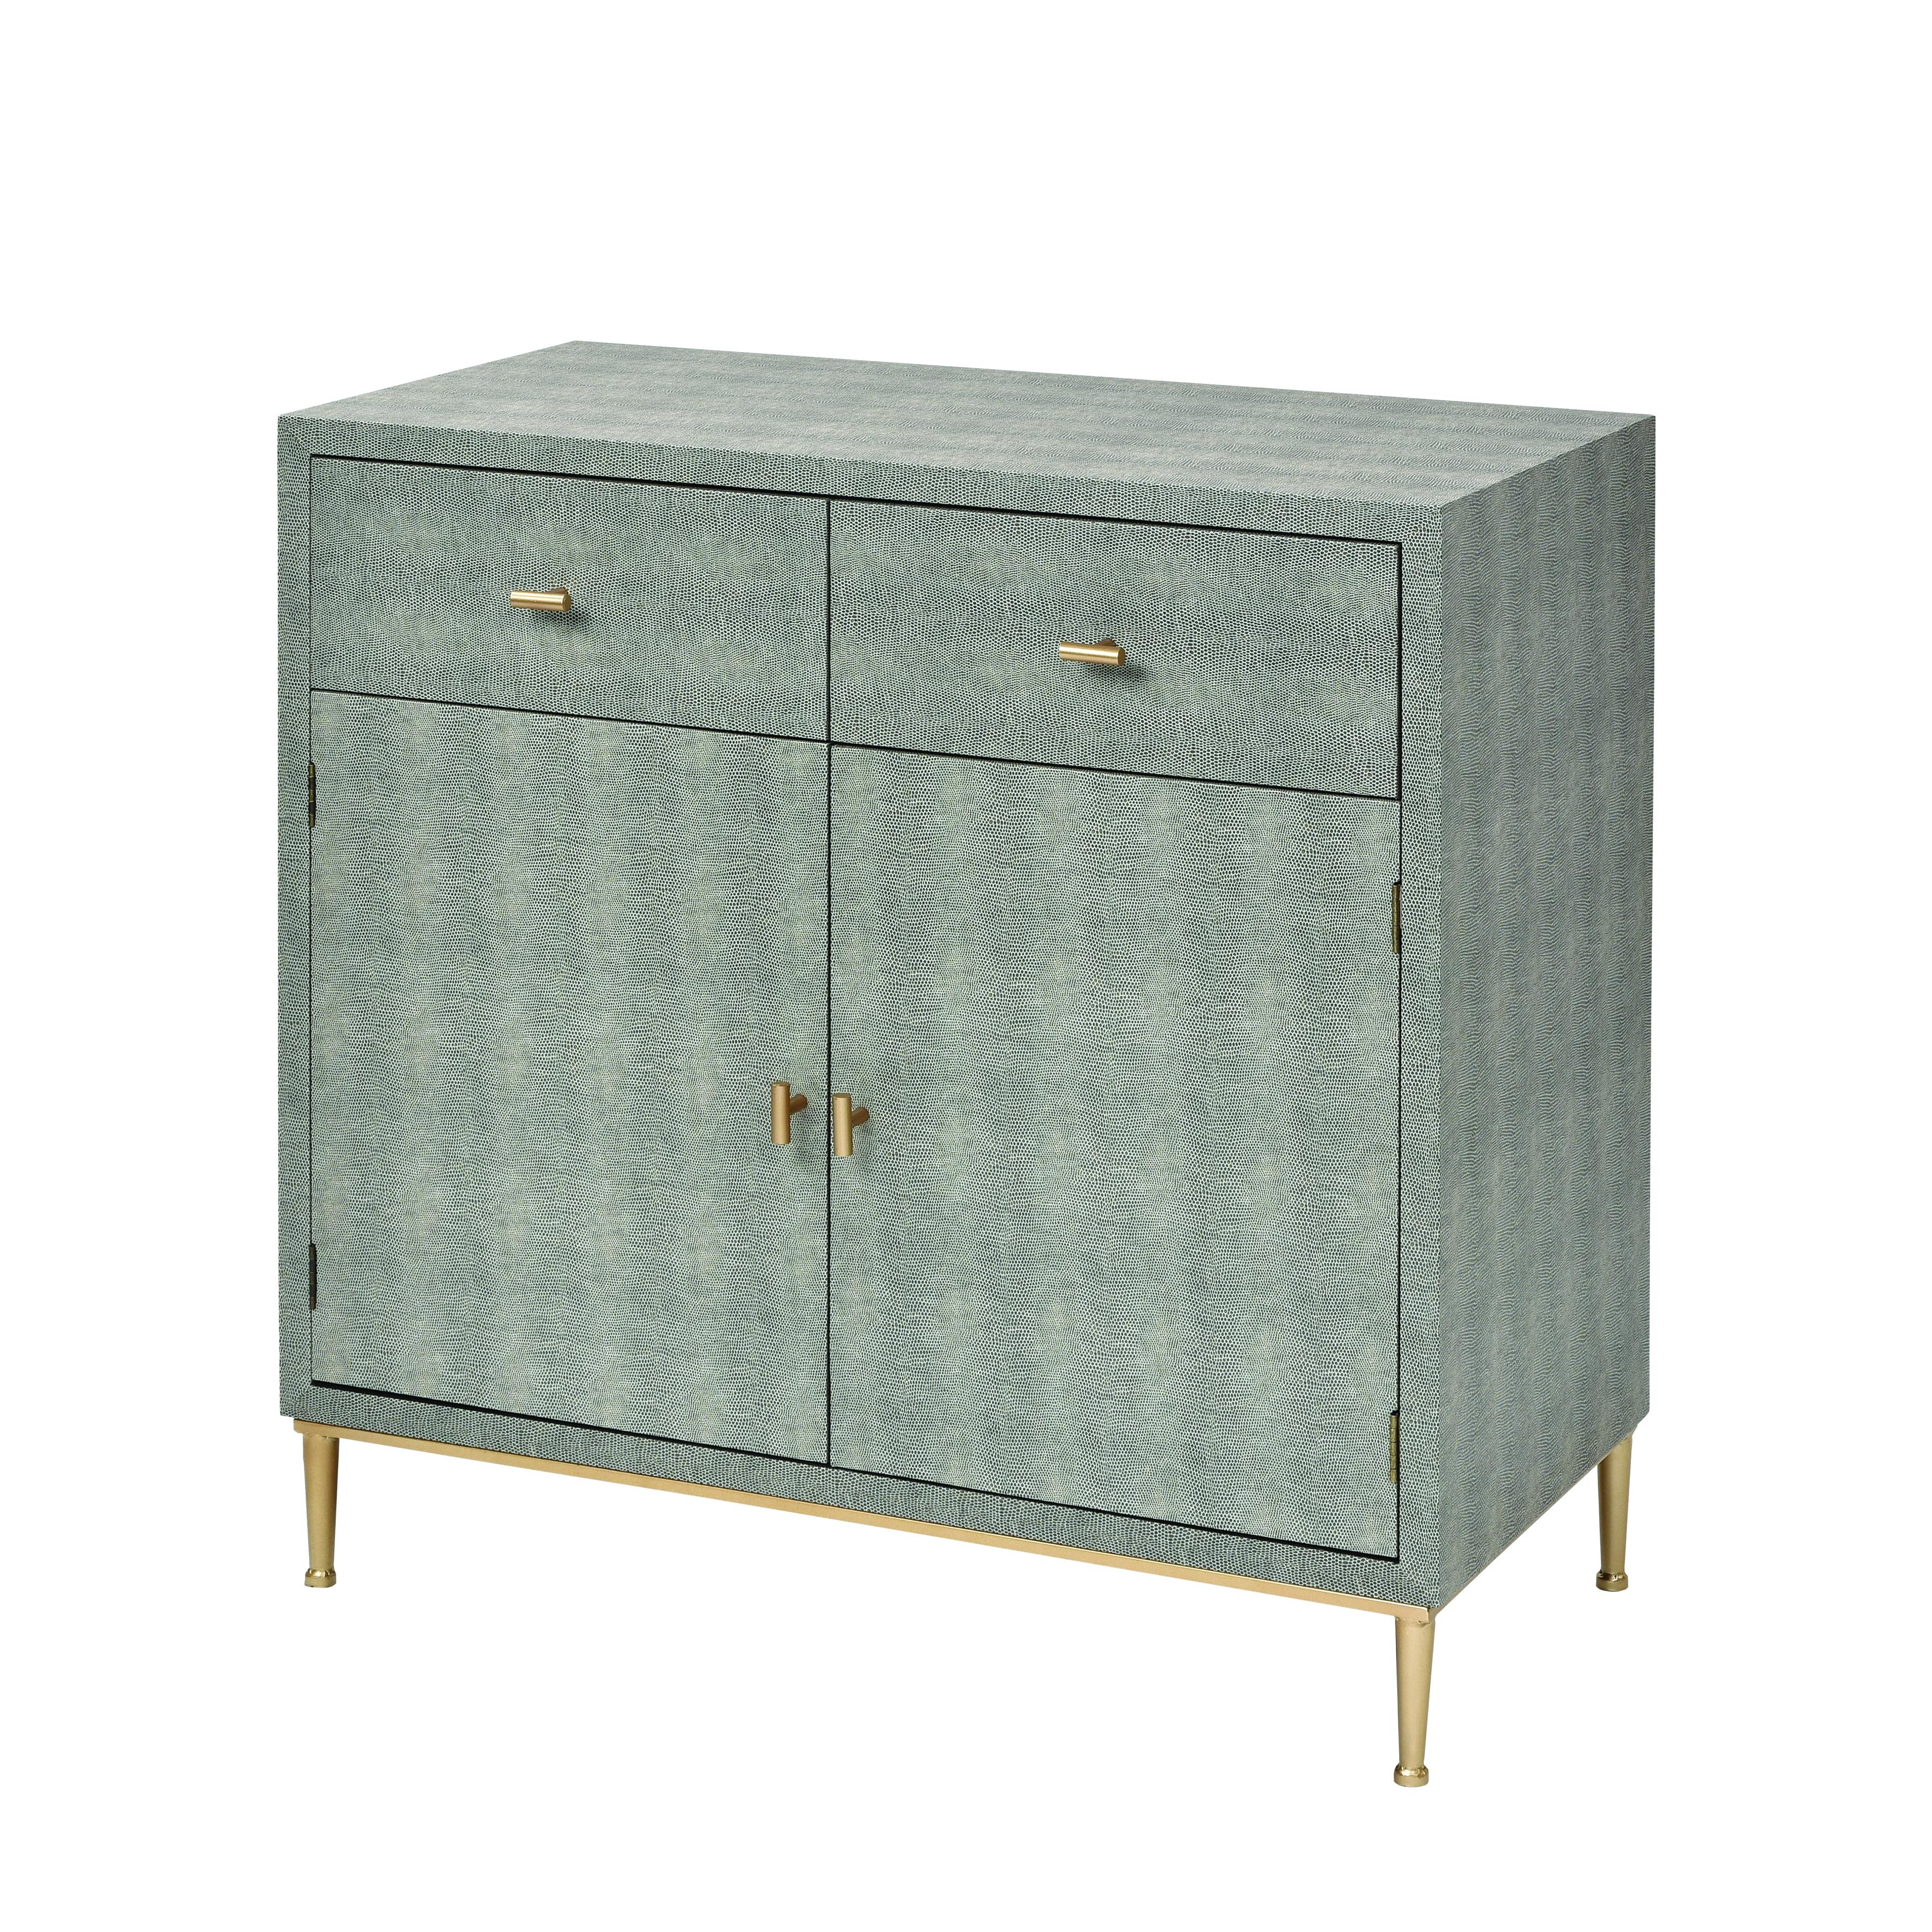 Sands Point 2-Door 2-Drawer Cabinet in Grey and Gold | Elk Home